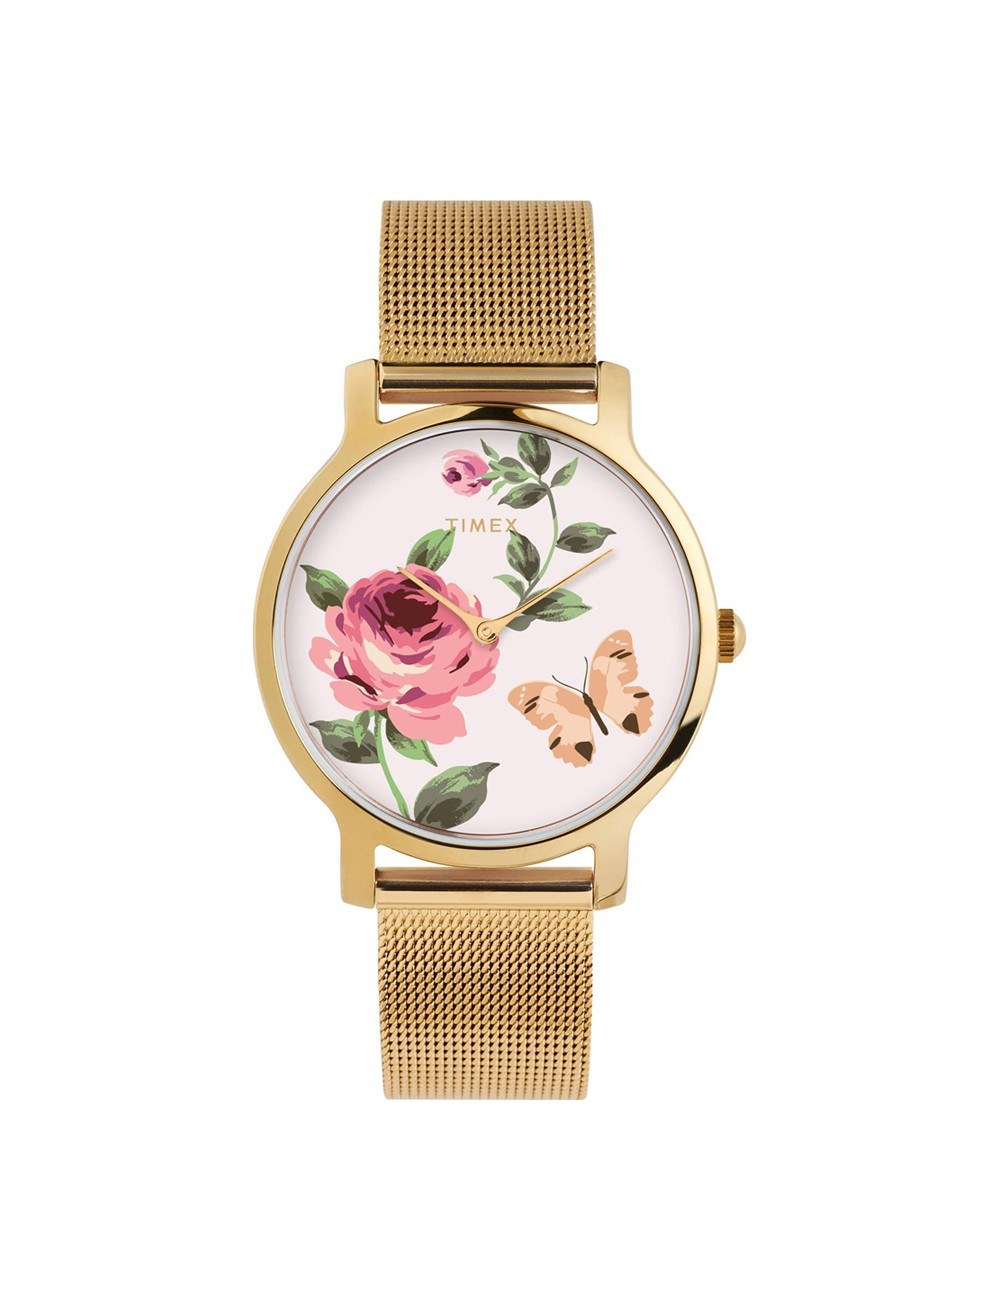 Timex Full Bloom TW2U19100 Ladies Watch